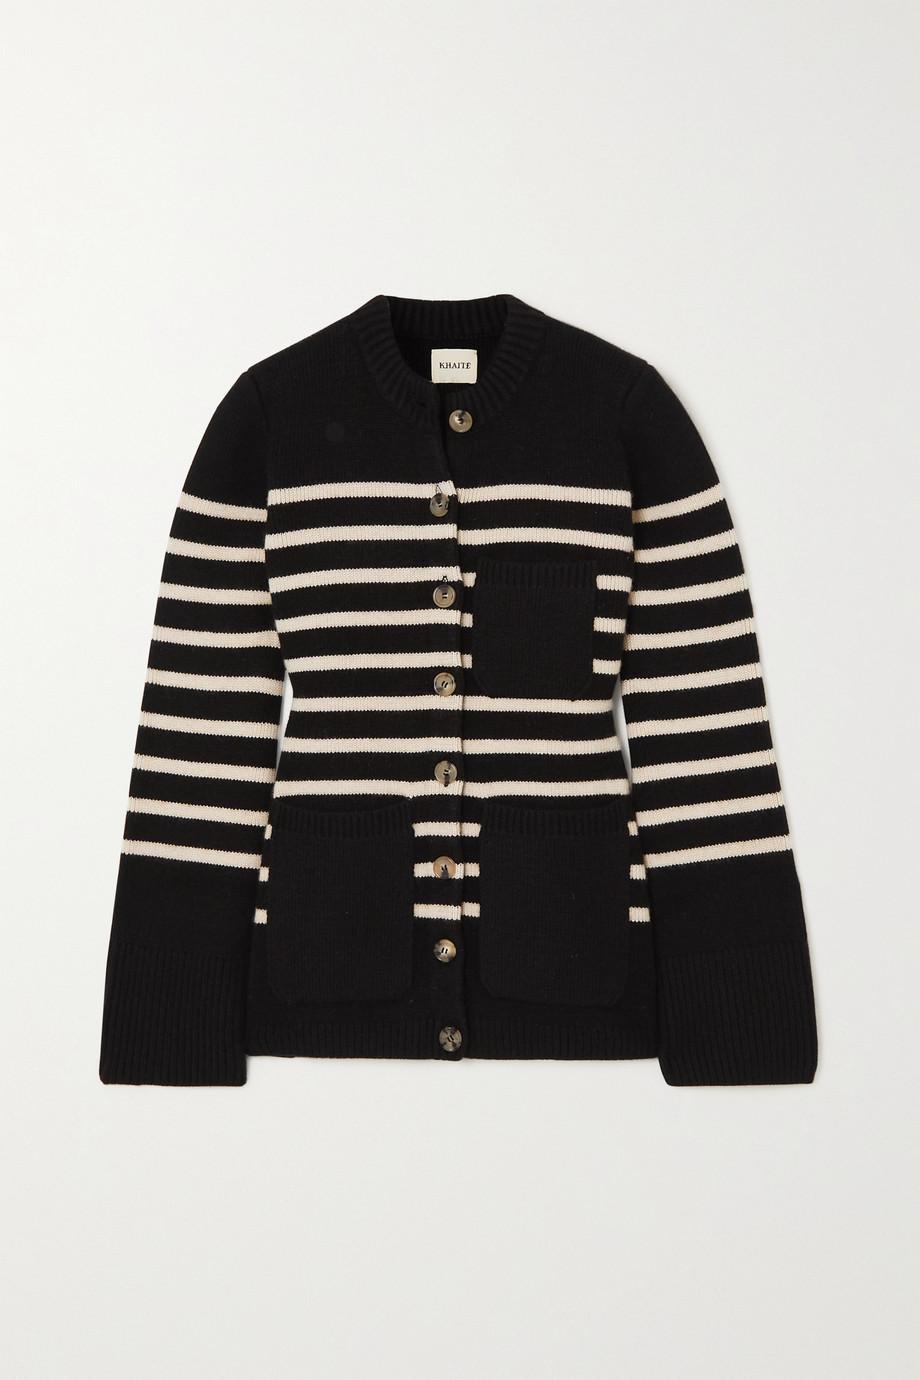 Khaite Suzette striped stretch-cashmere cardigan